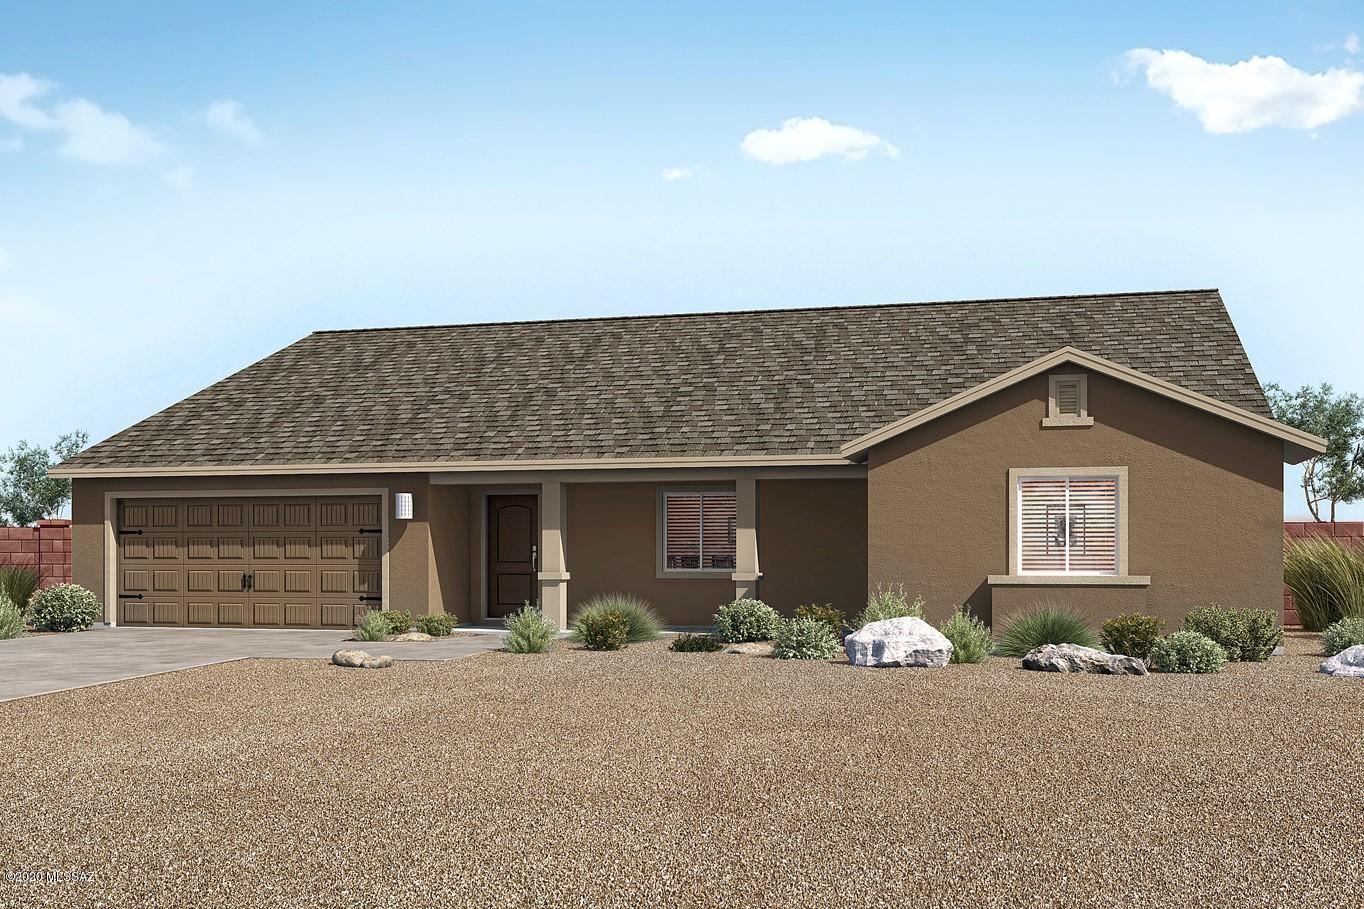 6960 S Victor Drive, Tucson, AZ 85757 - MLS#: 22015771